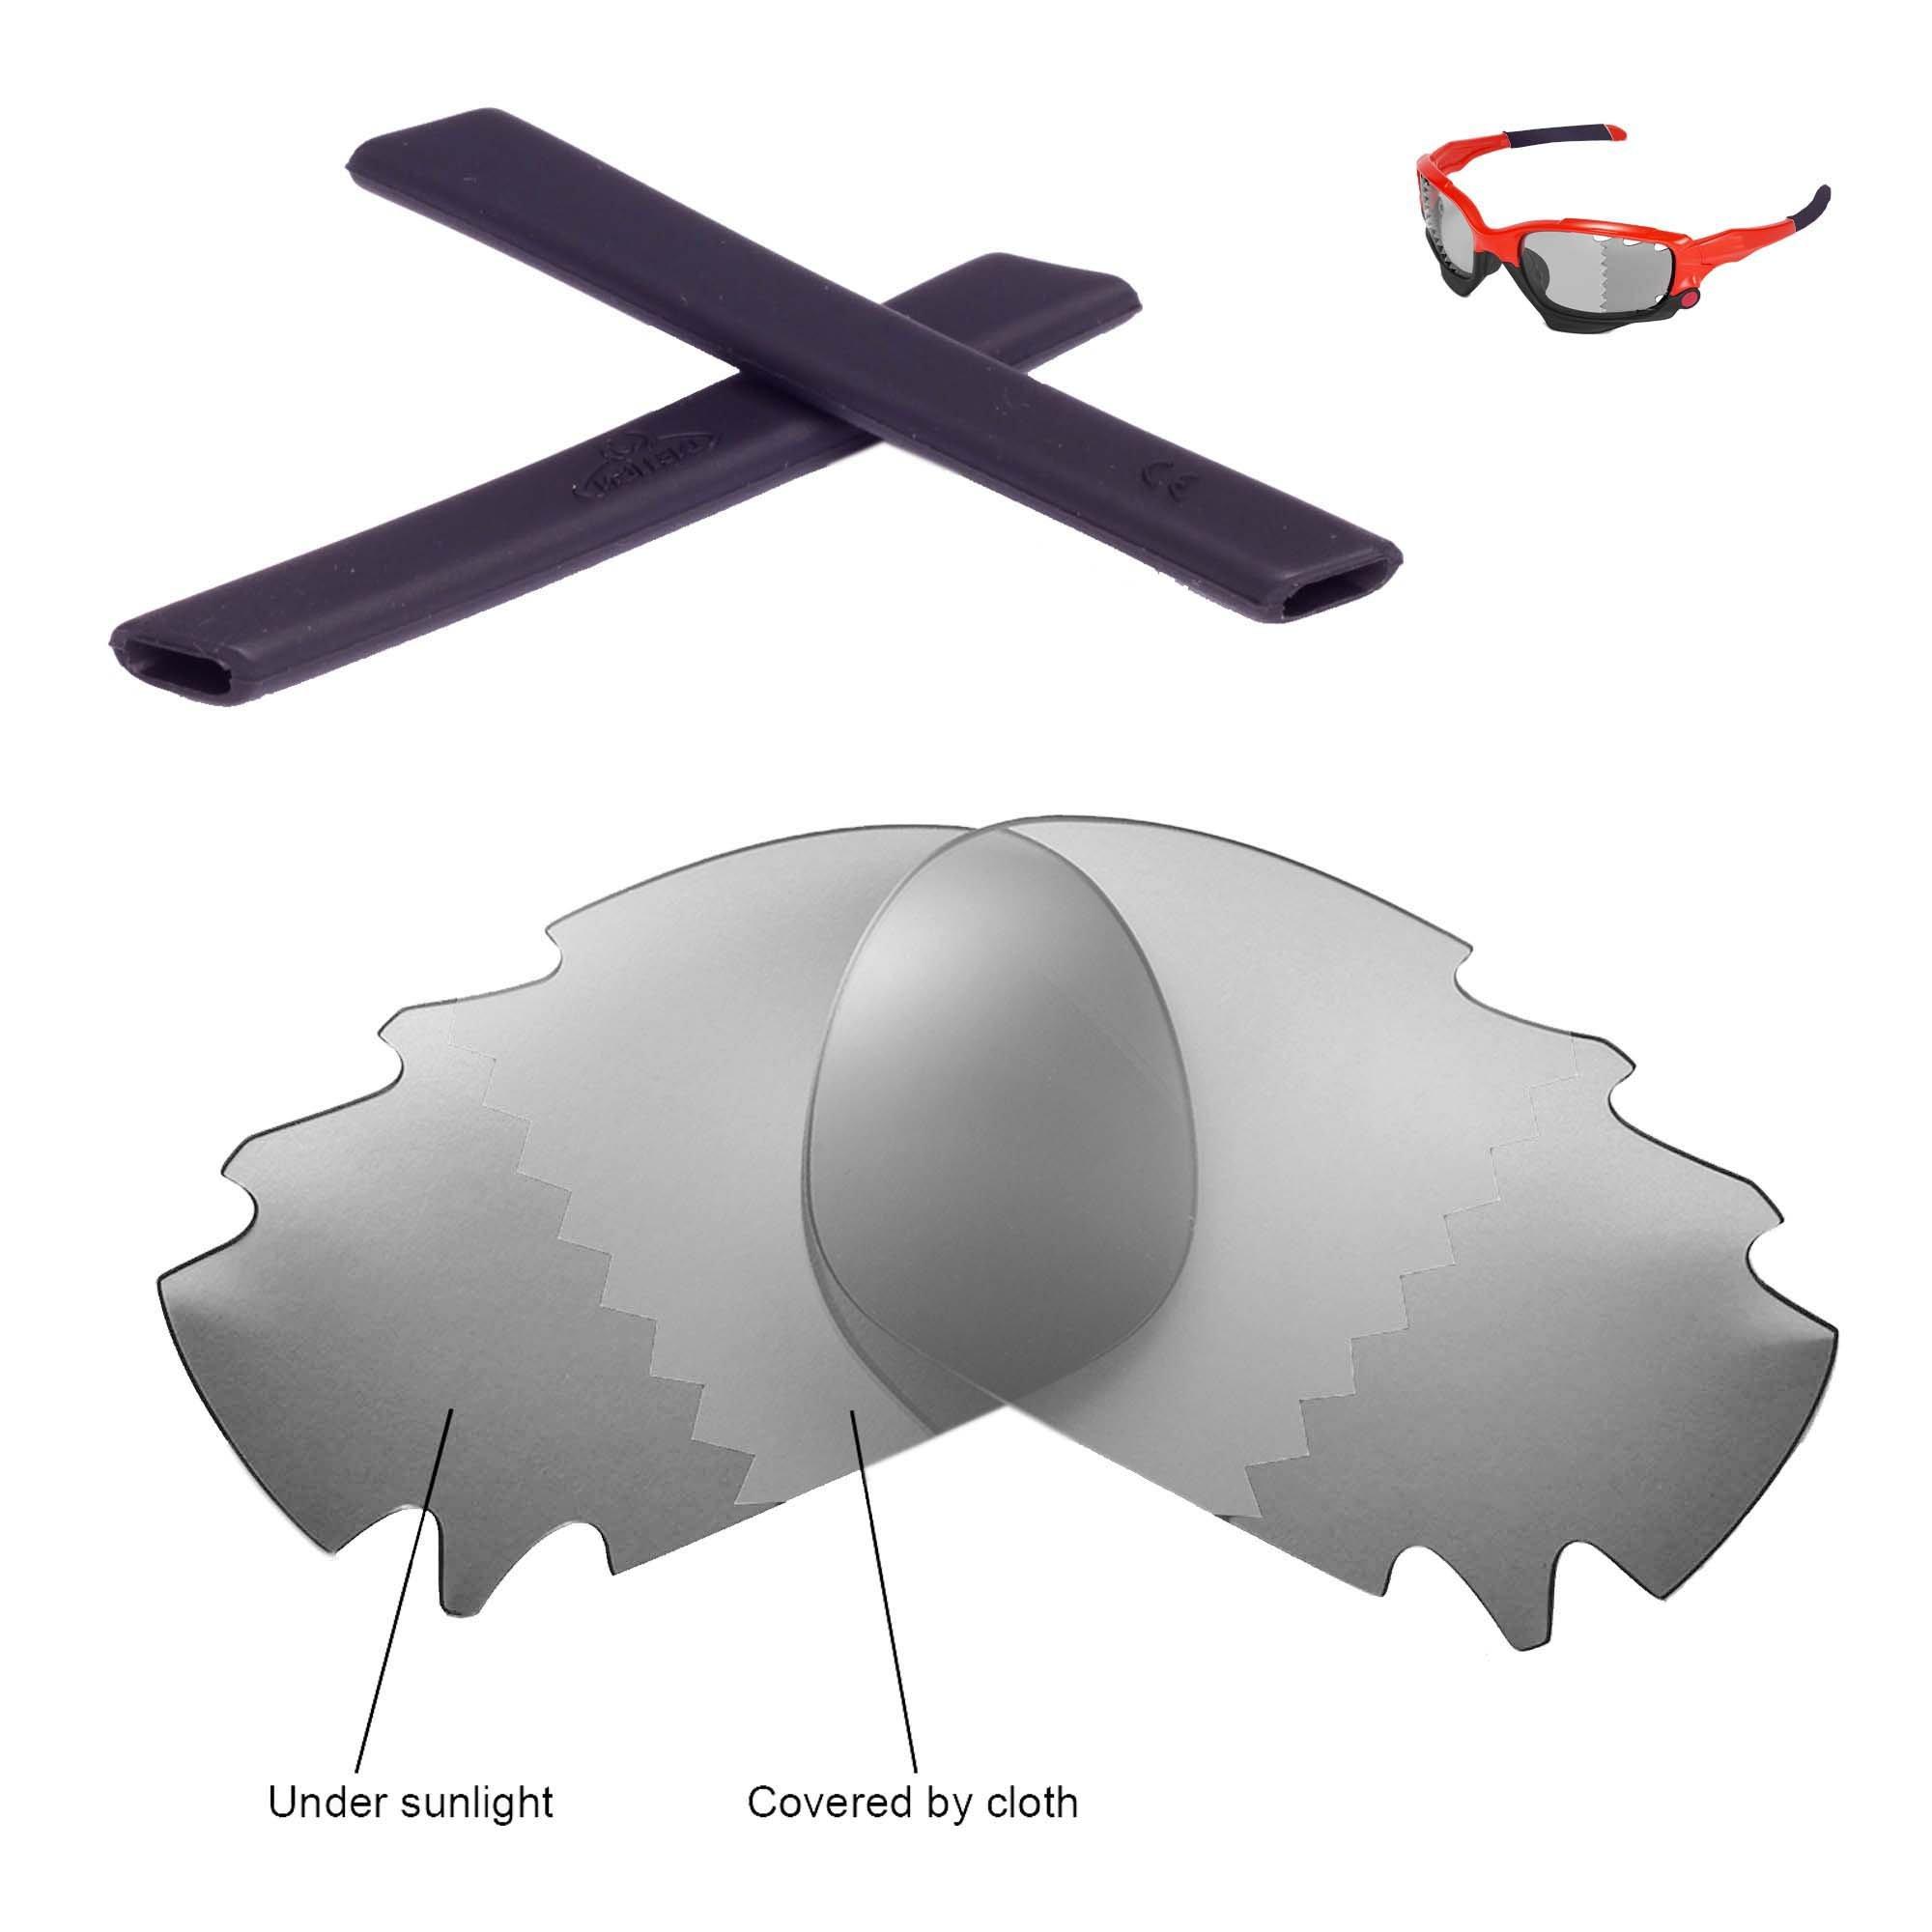 Walleva Vented Lenses and Rubber Kit(Earsocks) for Oakley Jawbone - 11 Options Available (Transition Polarized Lenses + Black Rubber)